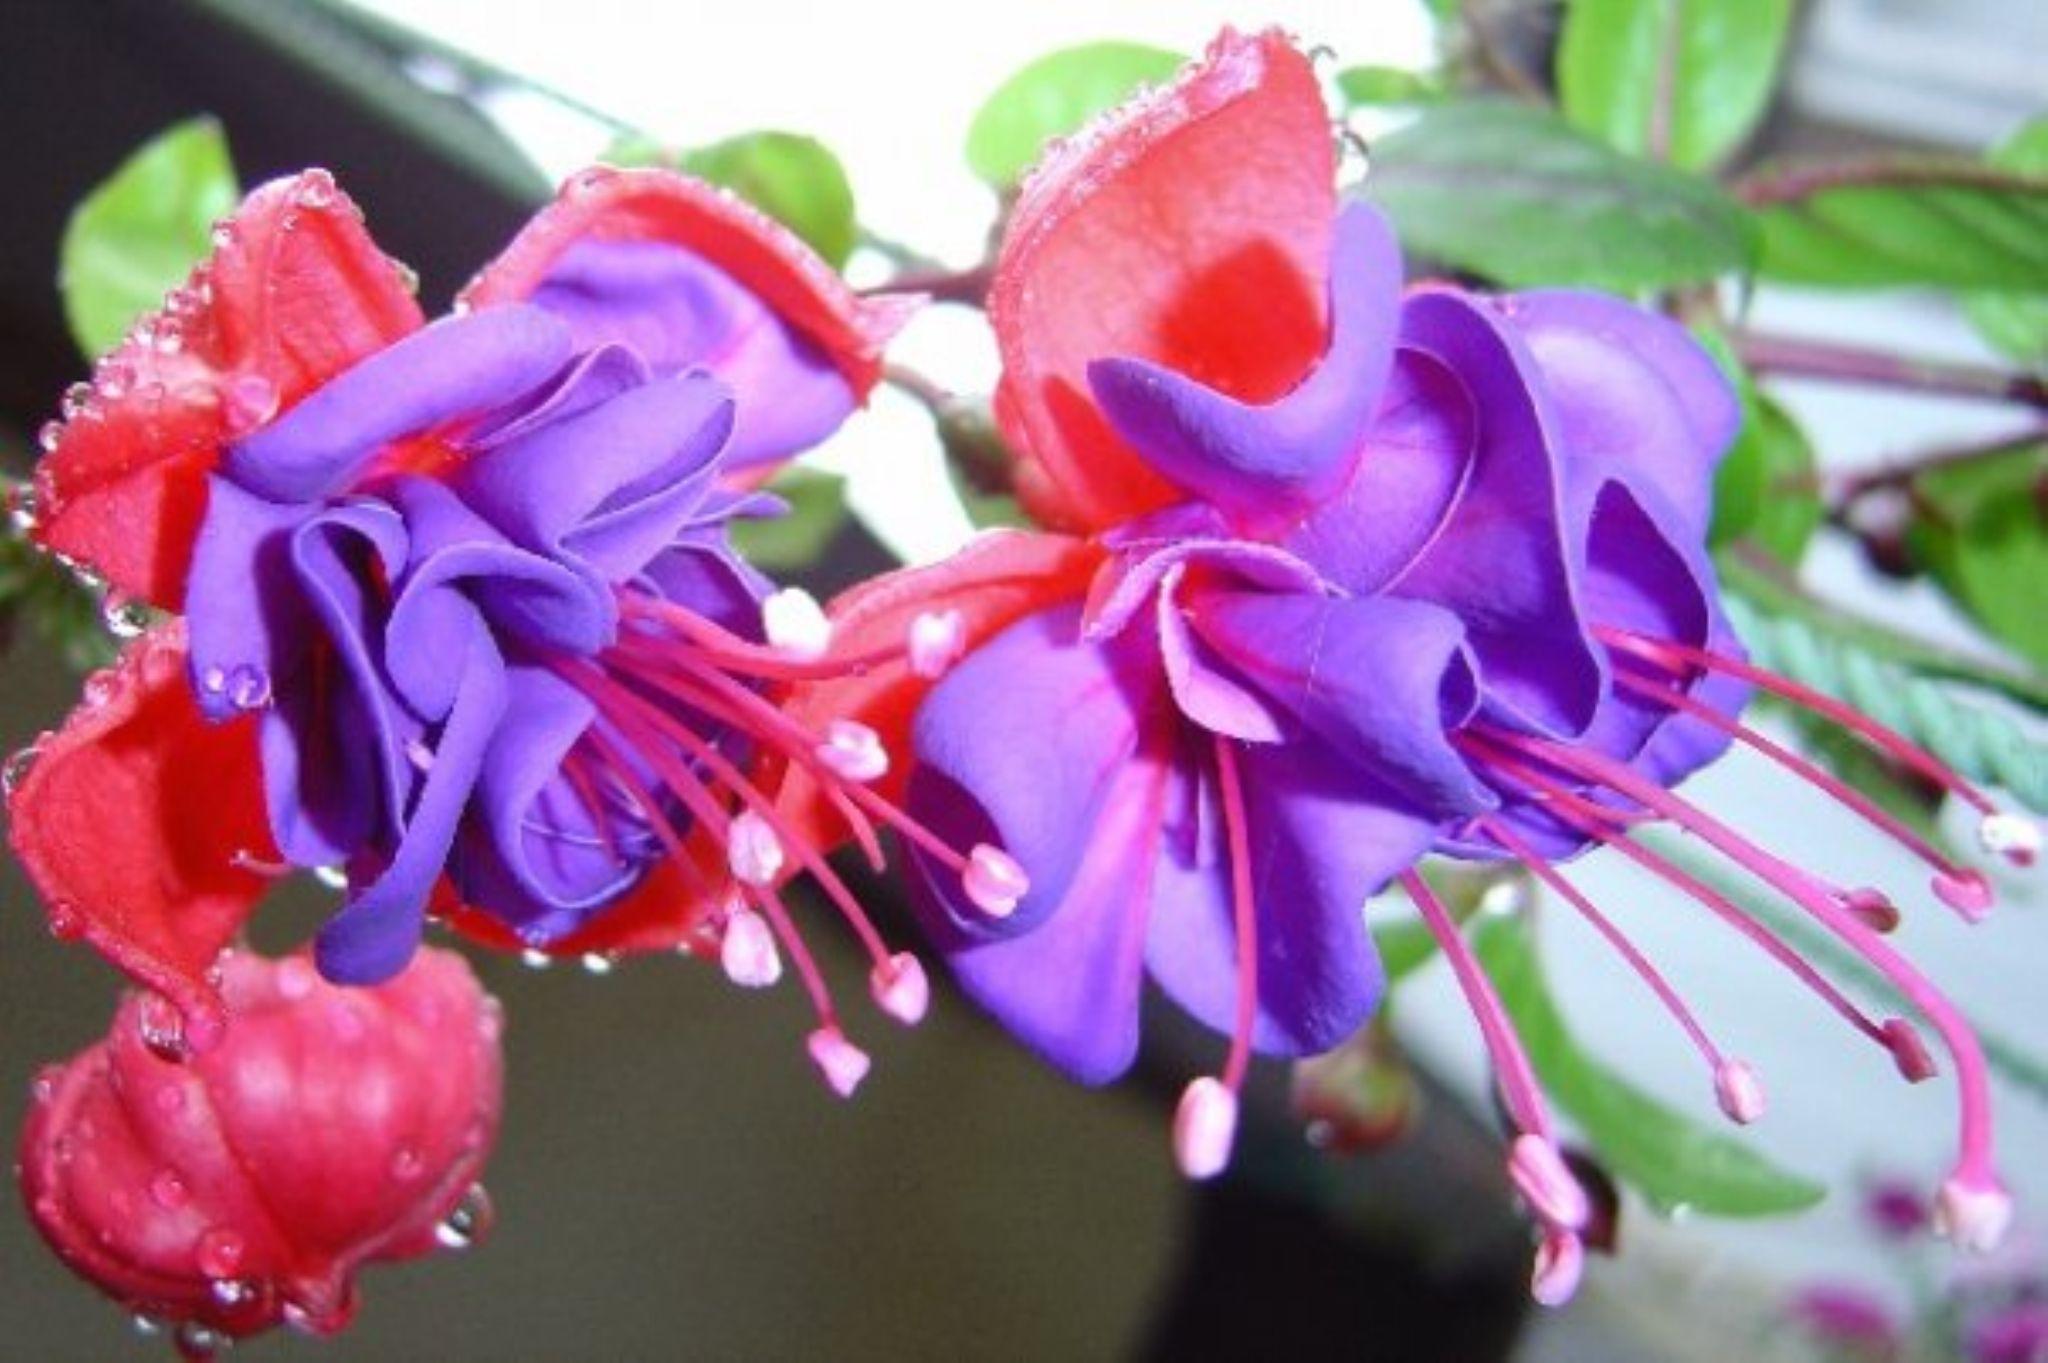 Fuscia Plant by Annette McCann